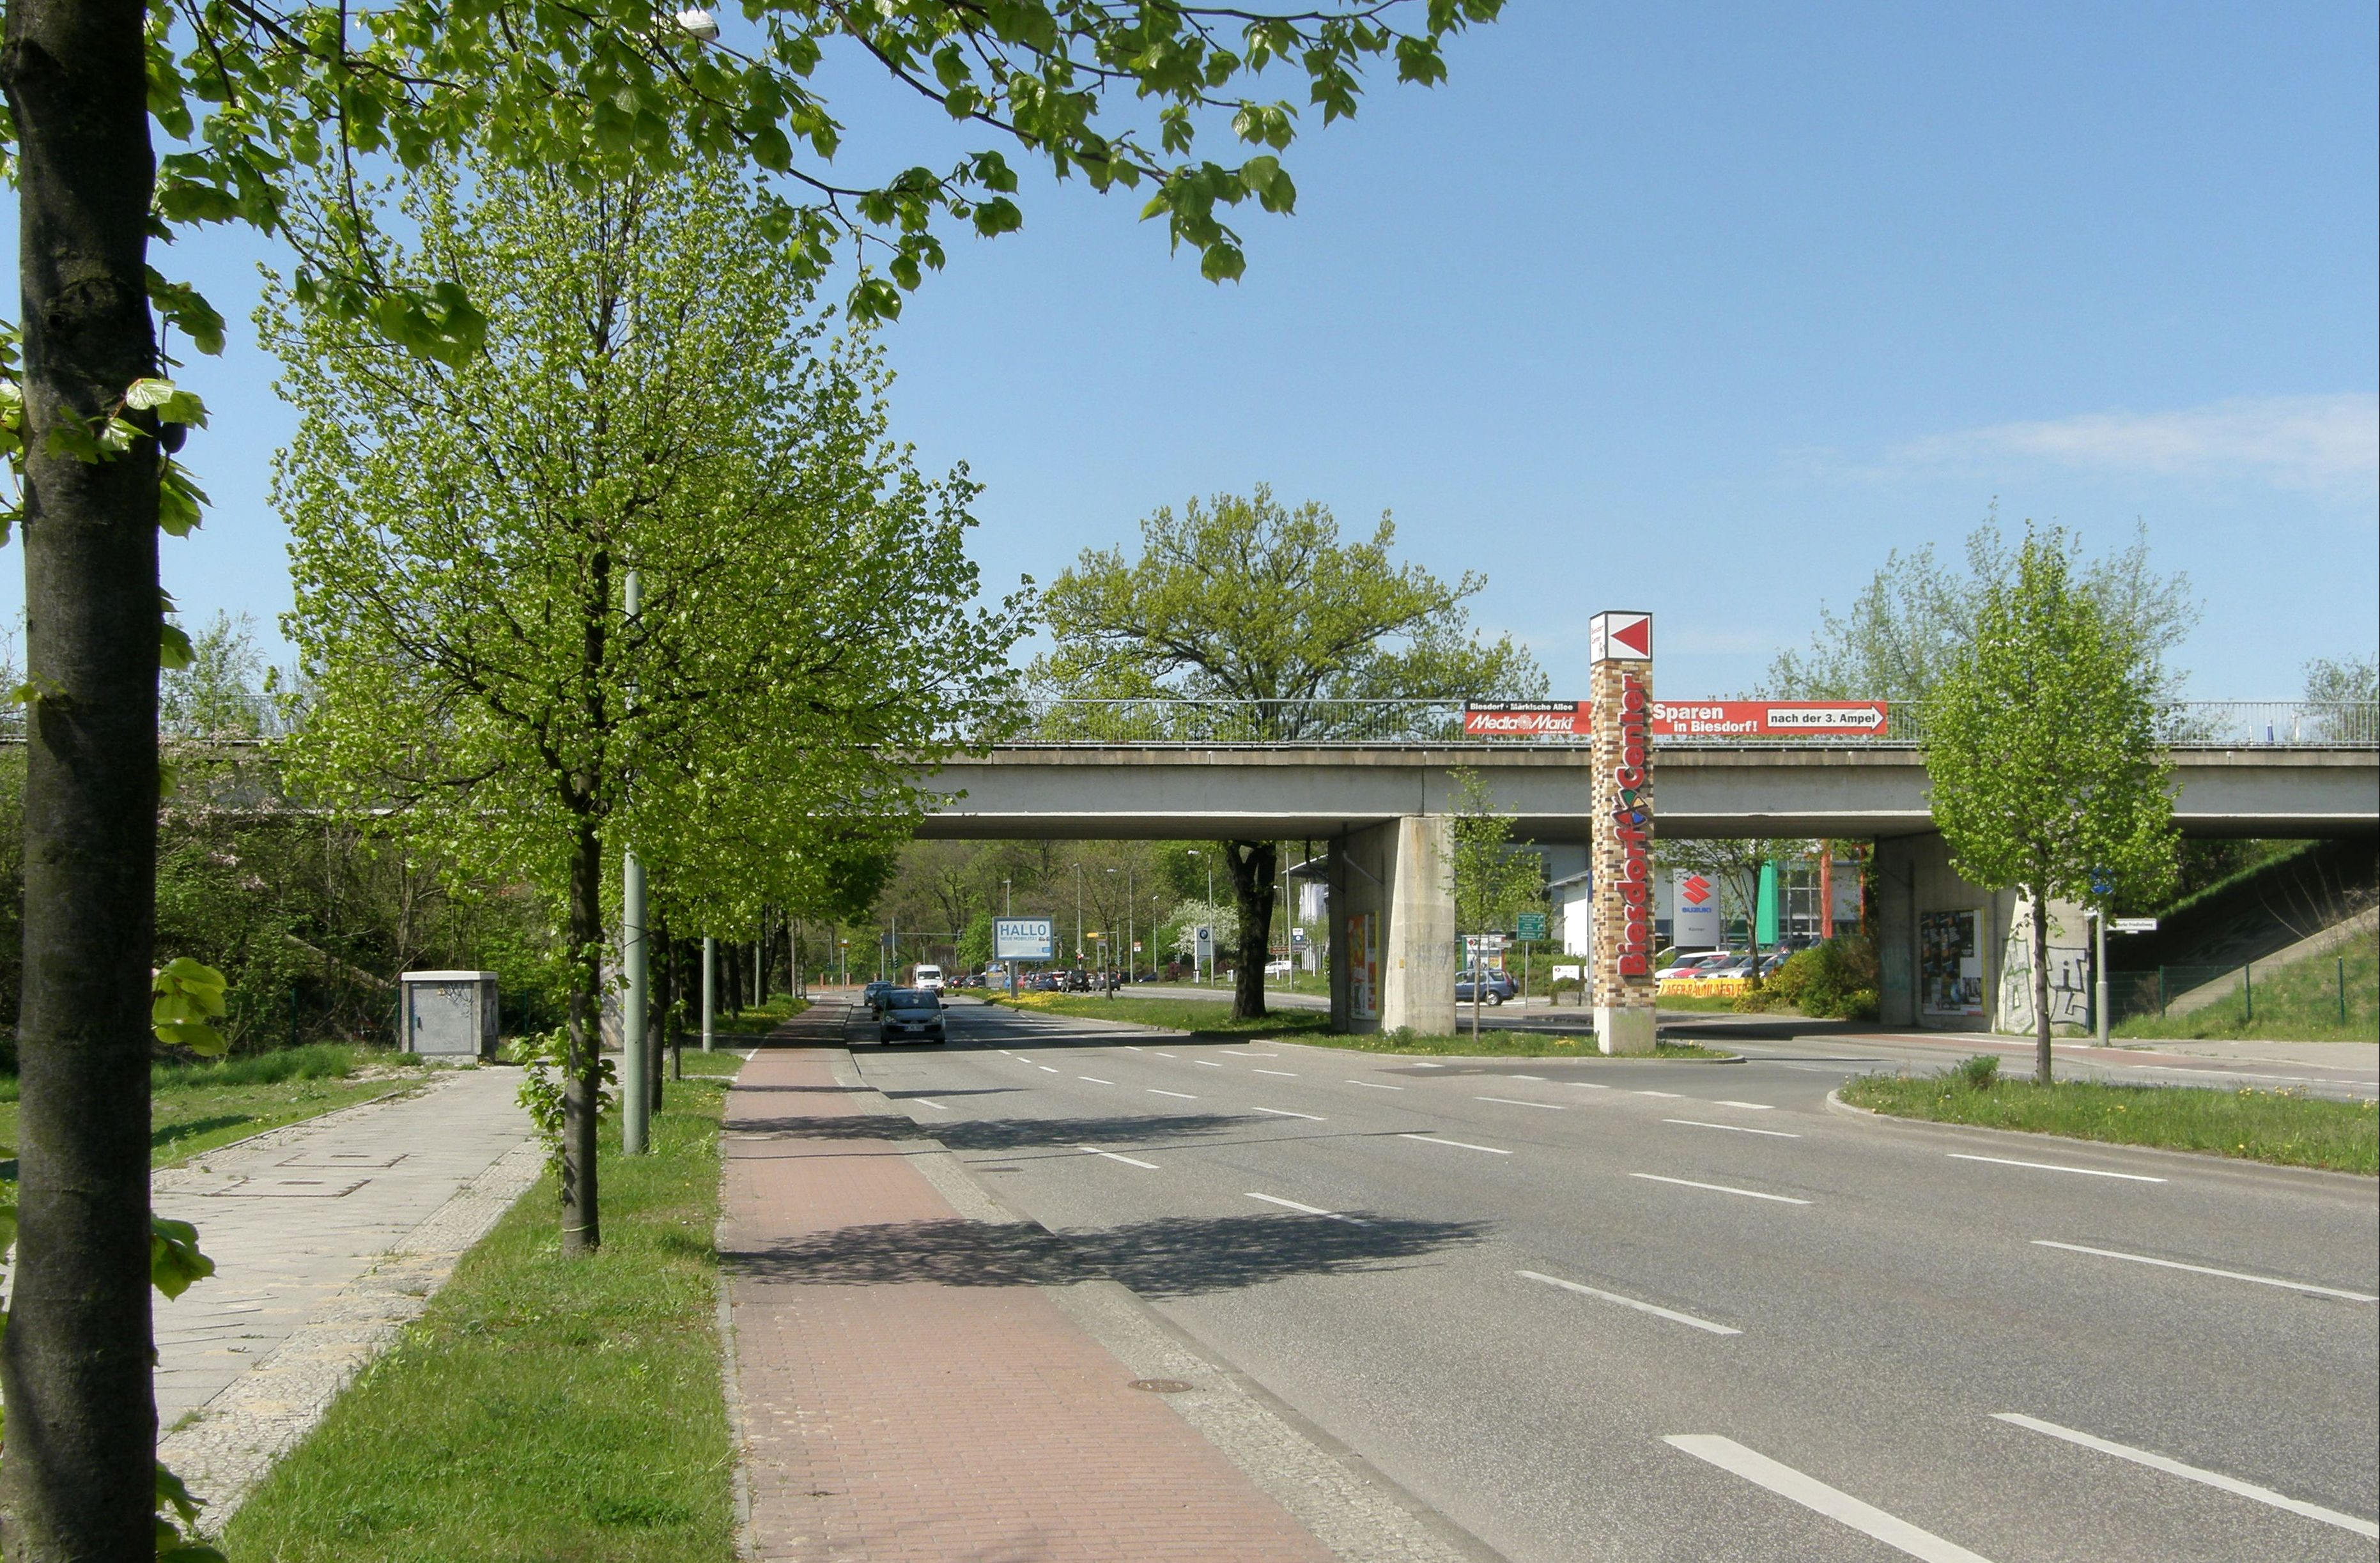 File:Alt-Biesdorf 2012-4-27 ama fec U-Bahn-Brücke 360s.jpg